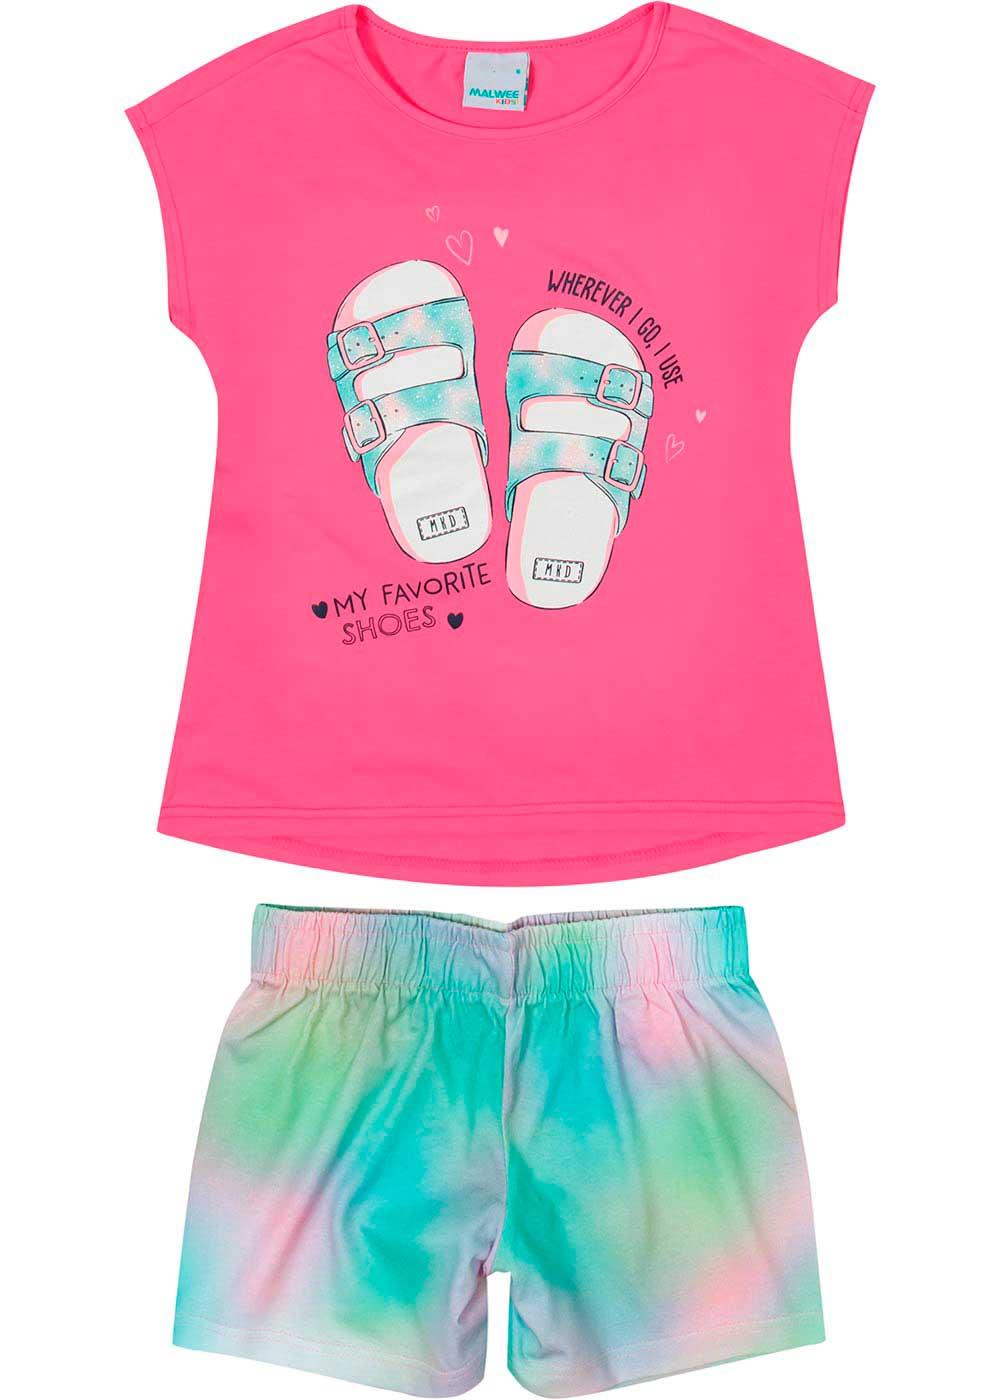 Conjunto Infantil Feminino Curto Rosa My Favorite - Malwee